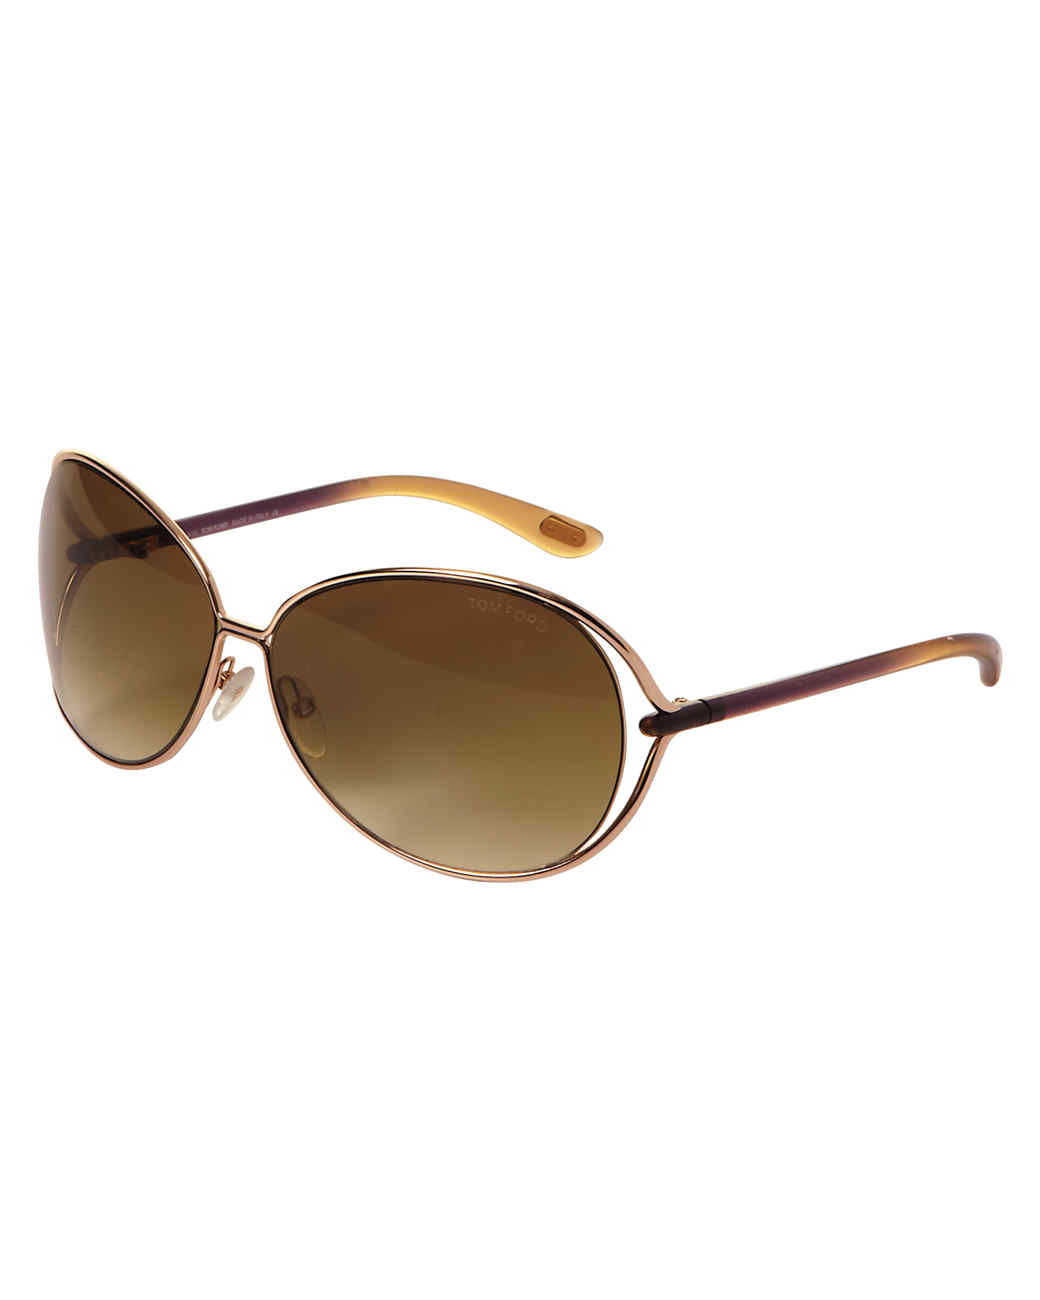 tomford-rosegold-sunglasses-v1-3-mld110379.jpg